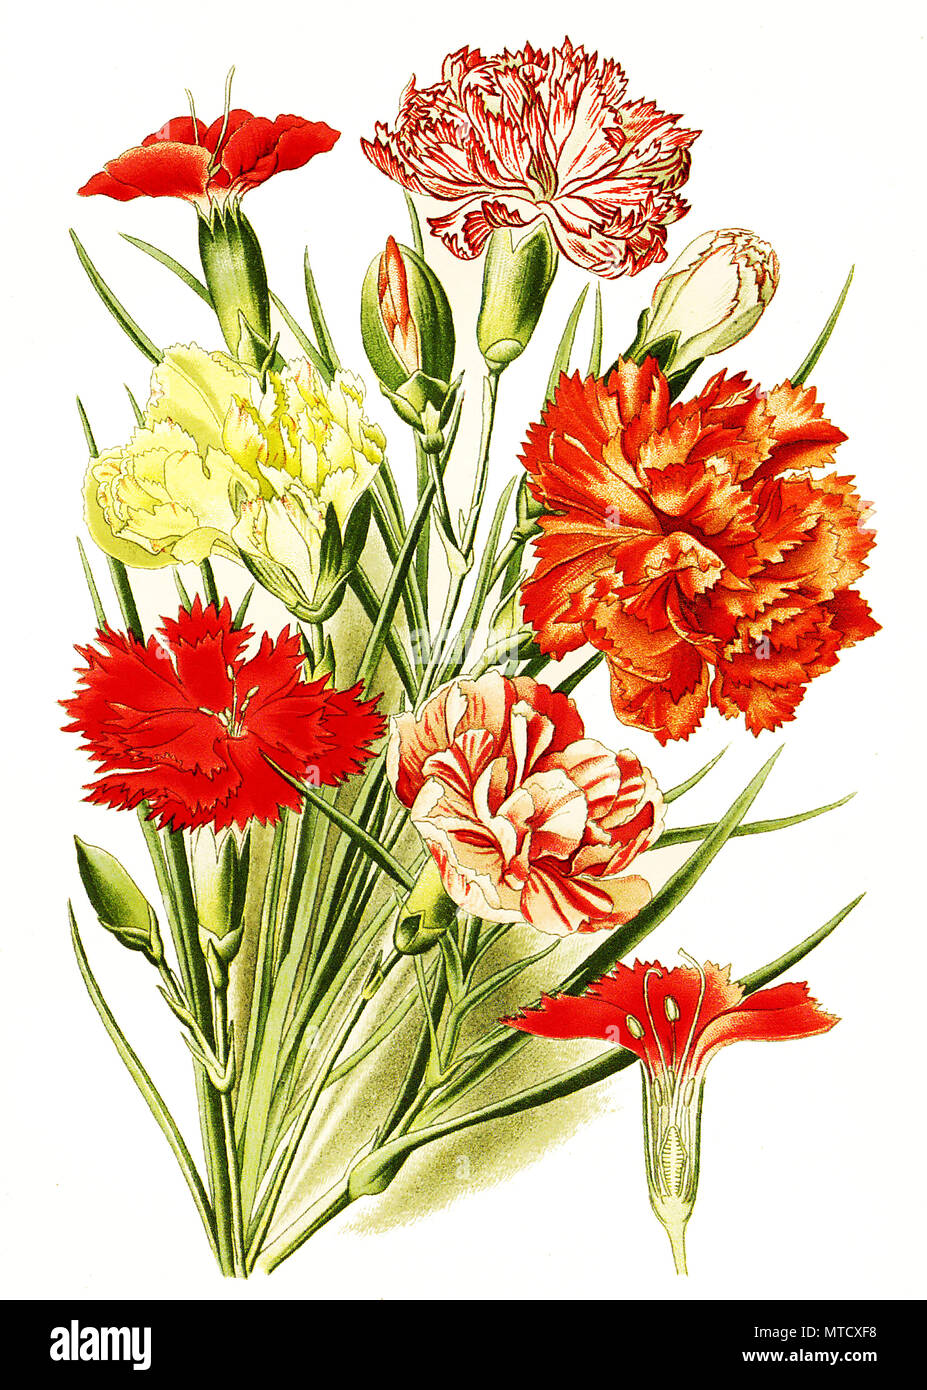 Dianthus caryophyllus, Carnation, clove pink. Landnelke oder Edel-Nelke, Gartennelke, Nelke, digital improved reproduction from a print of the 19th century - Stock Image